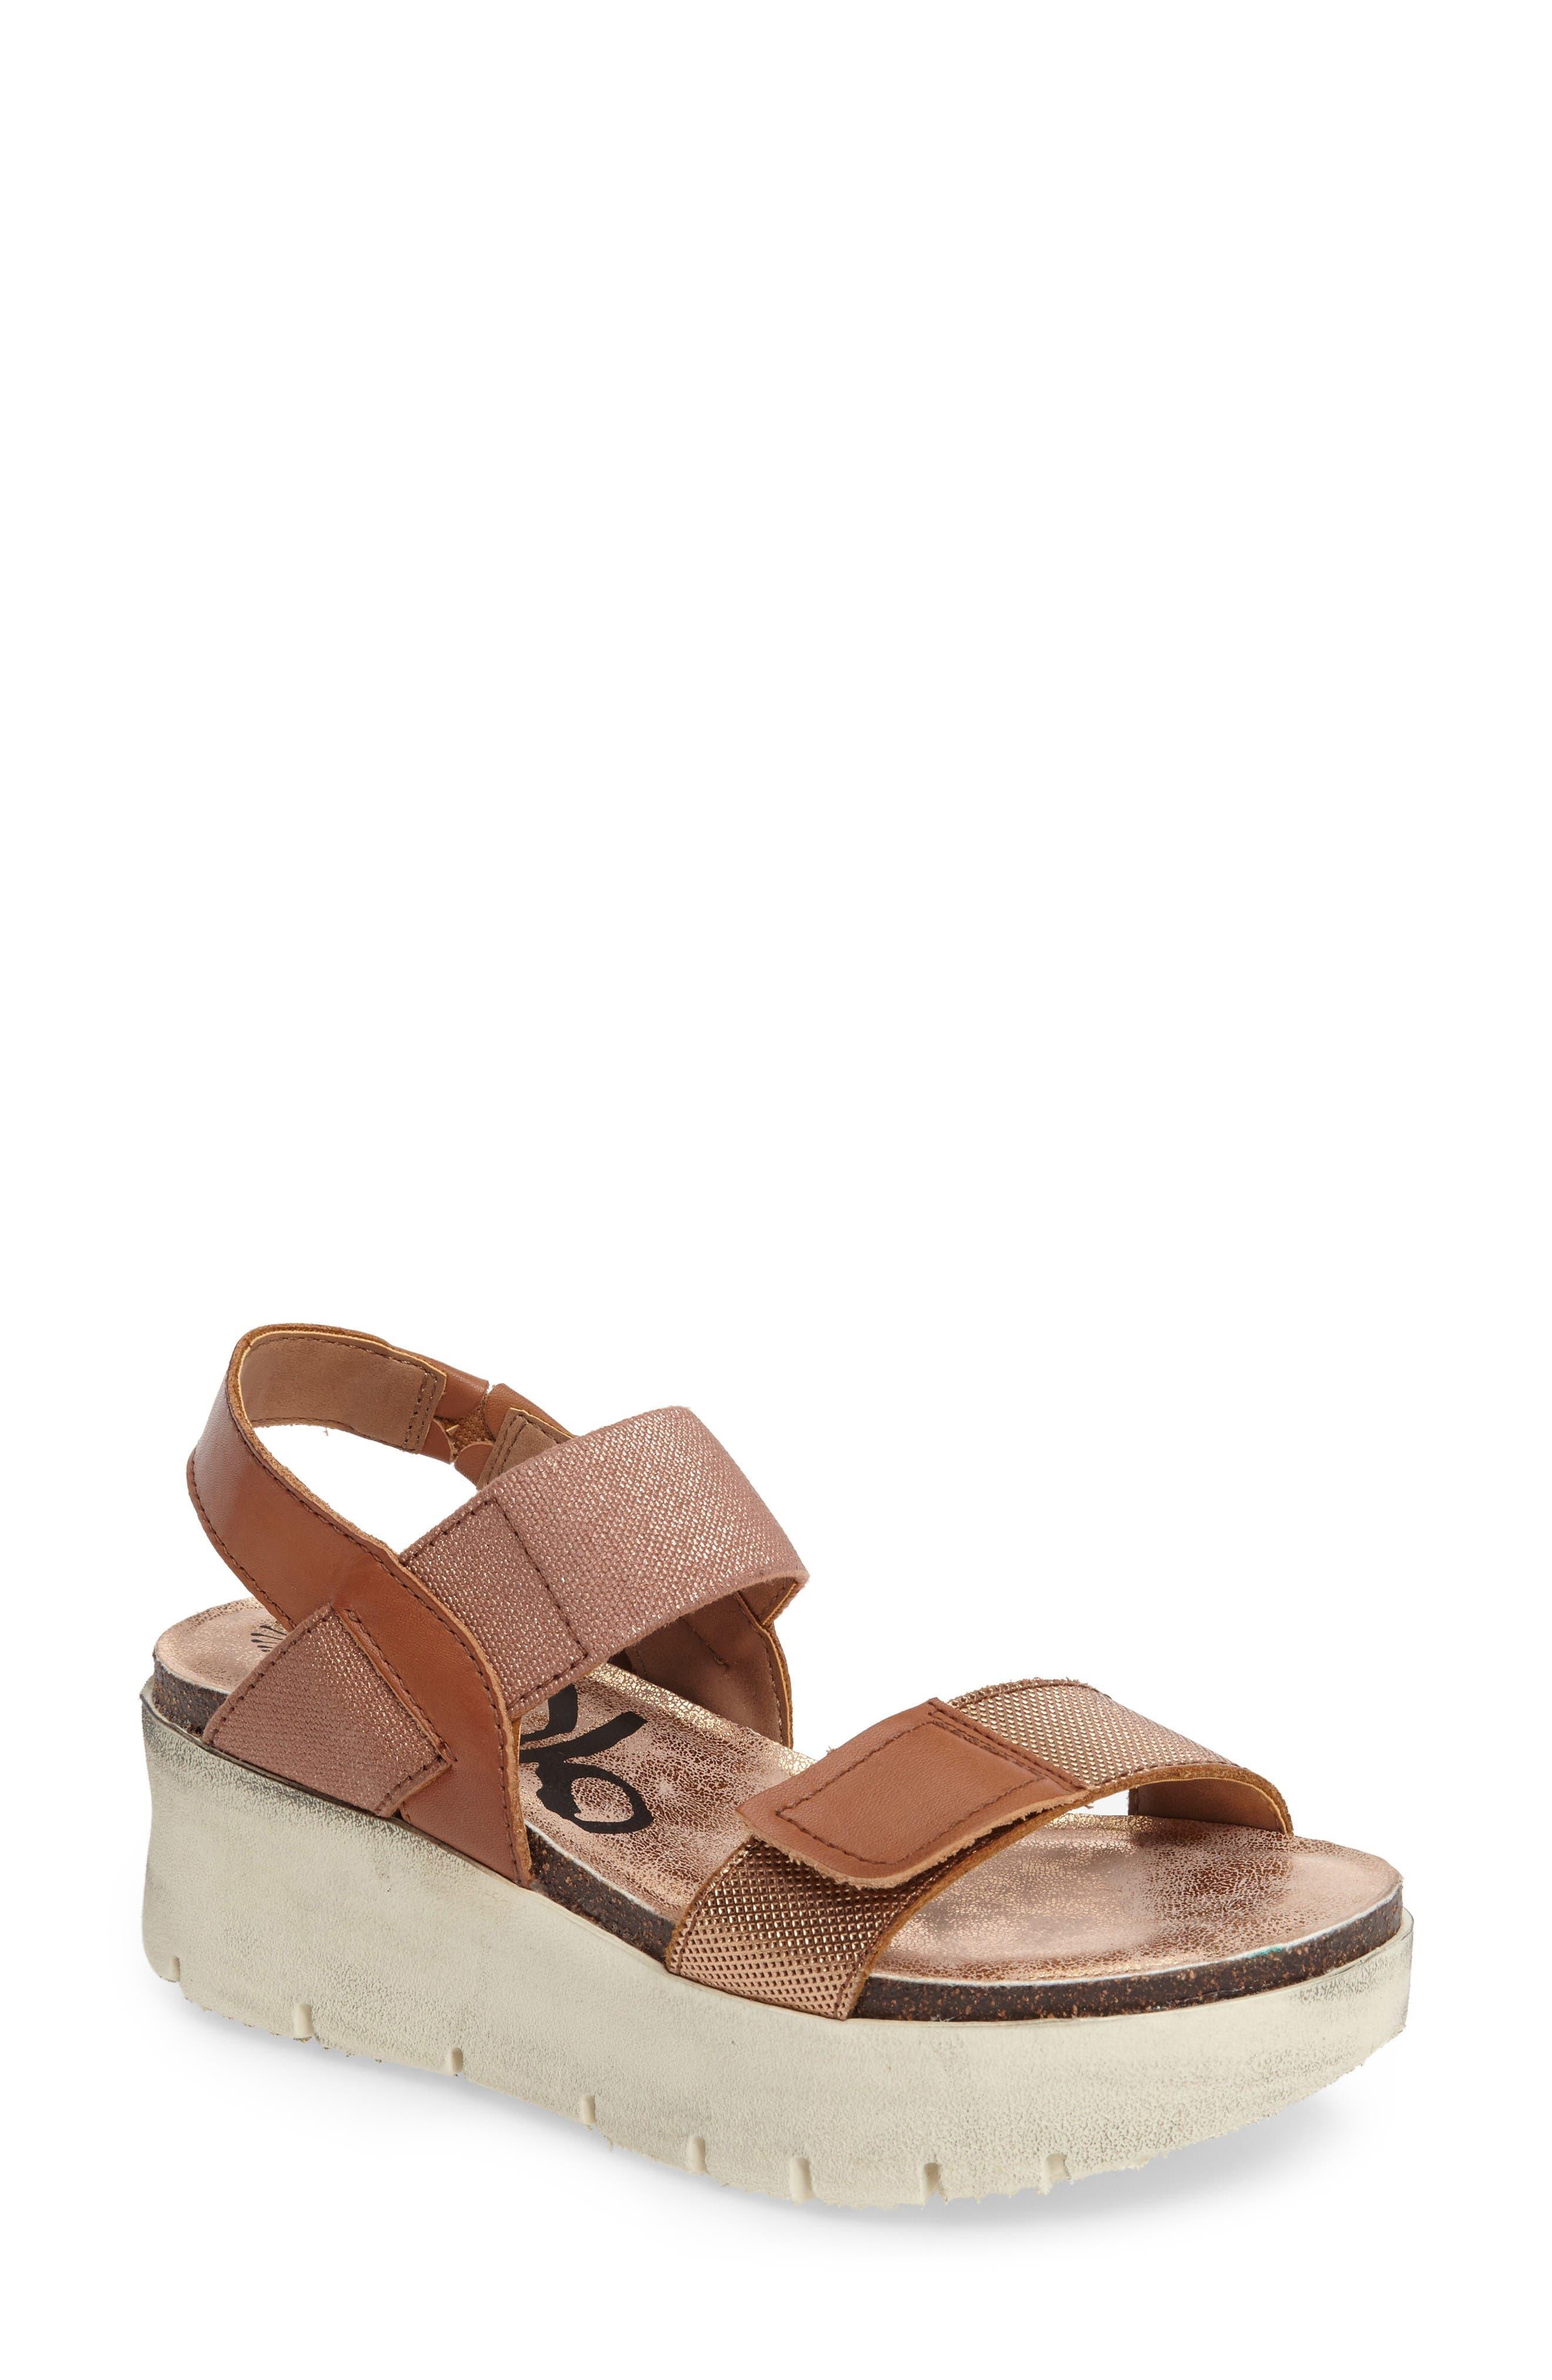 Nova Platform Sandal,                             Main thumbnail 1, color,                             Copper Leather